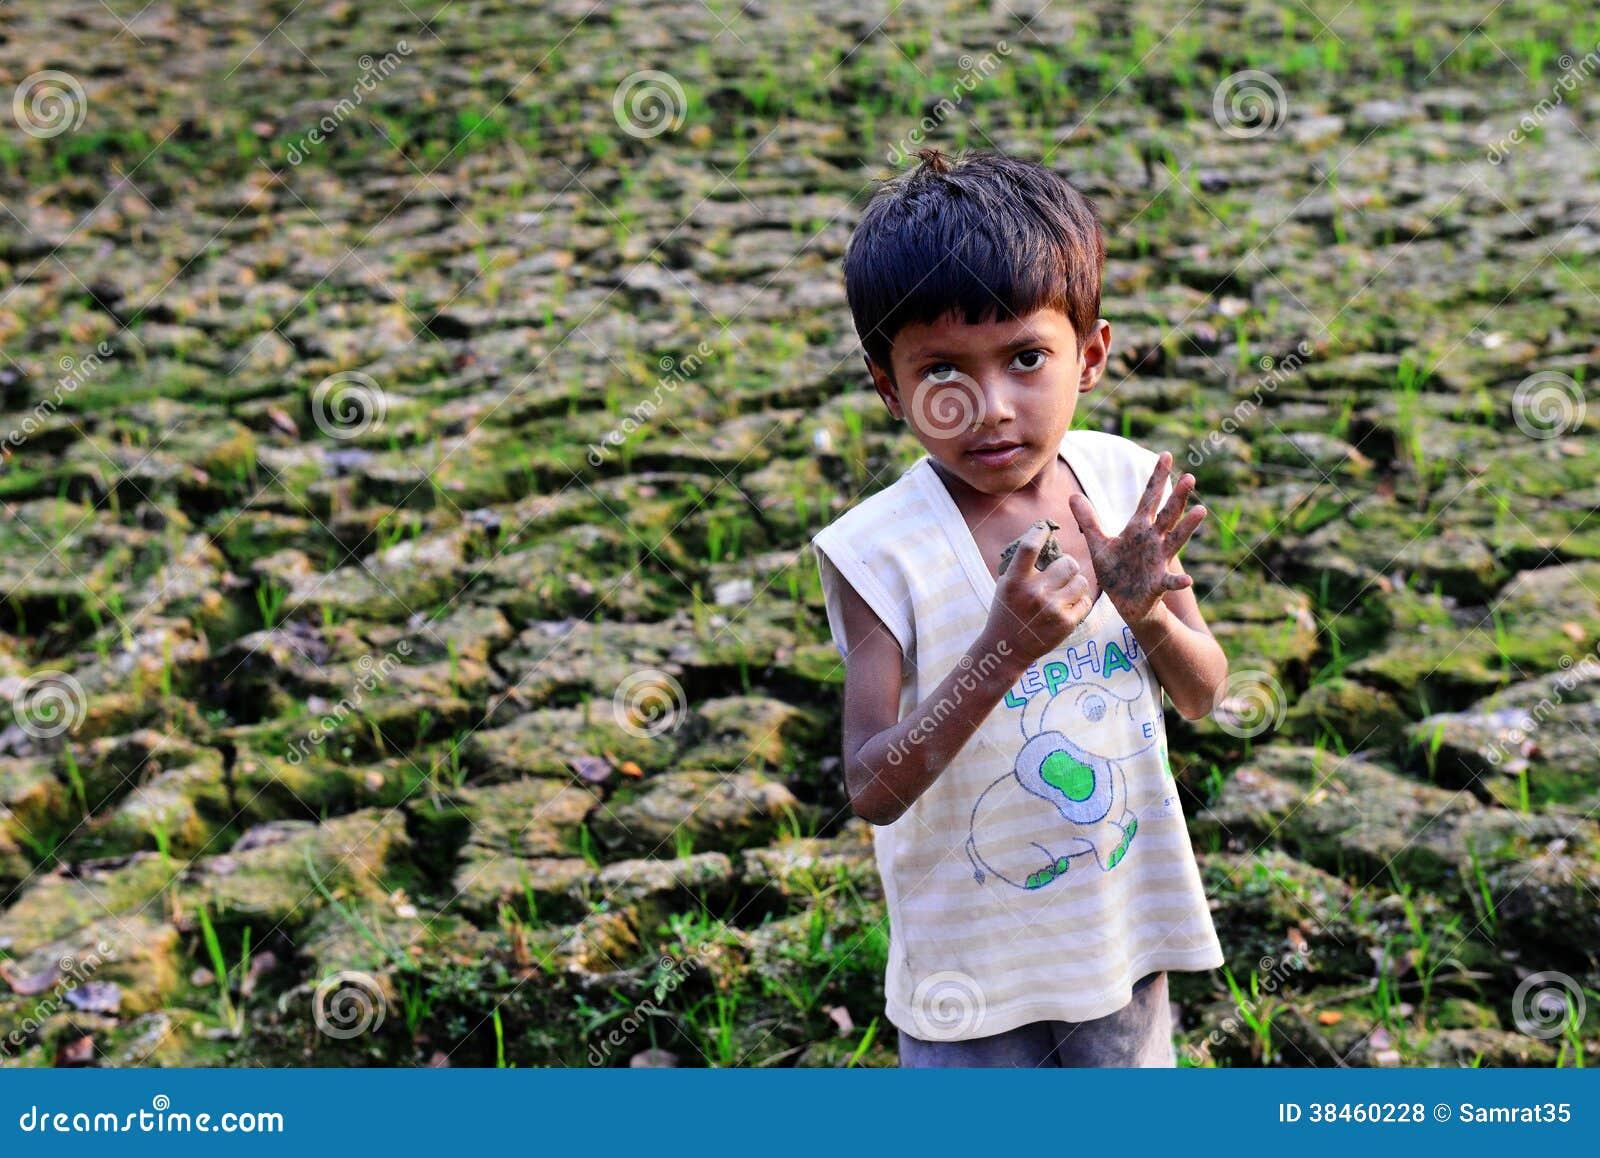 Village Boy Editorial Stock Photo Image 38460228